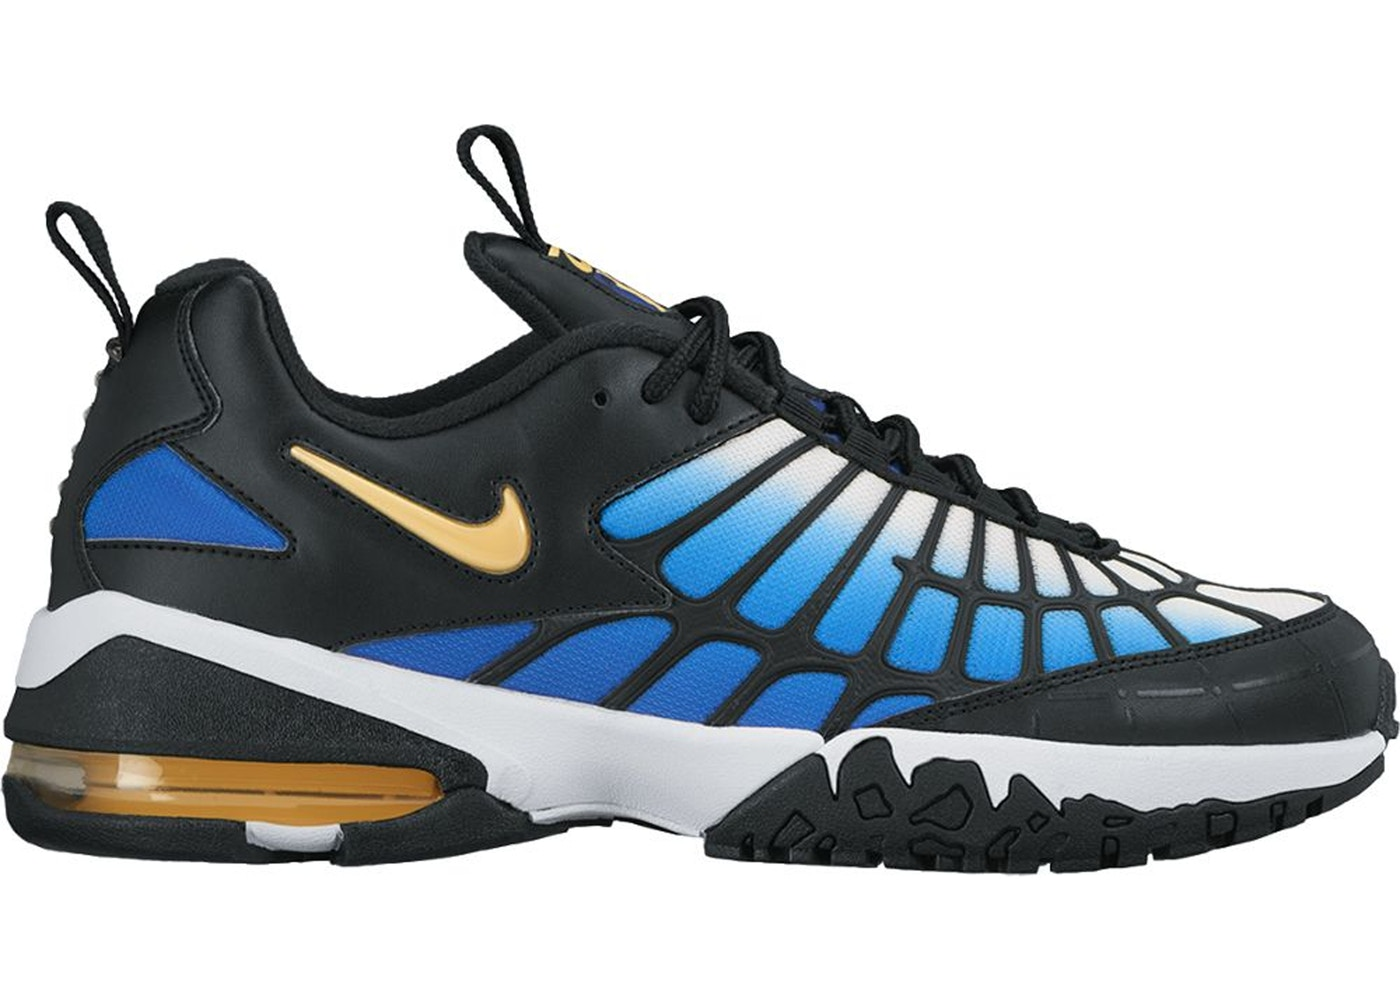 Men's Nike Air Max 120 Blue Size 9.5 NEW NWT